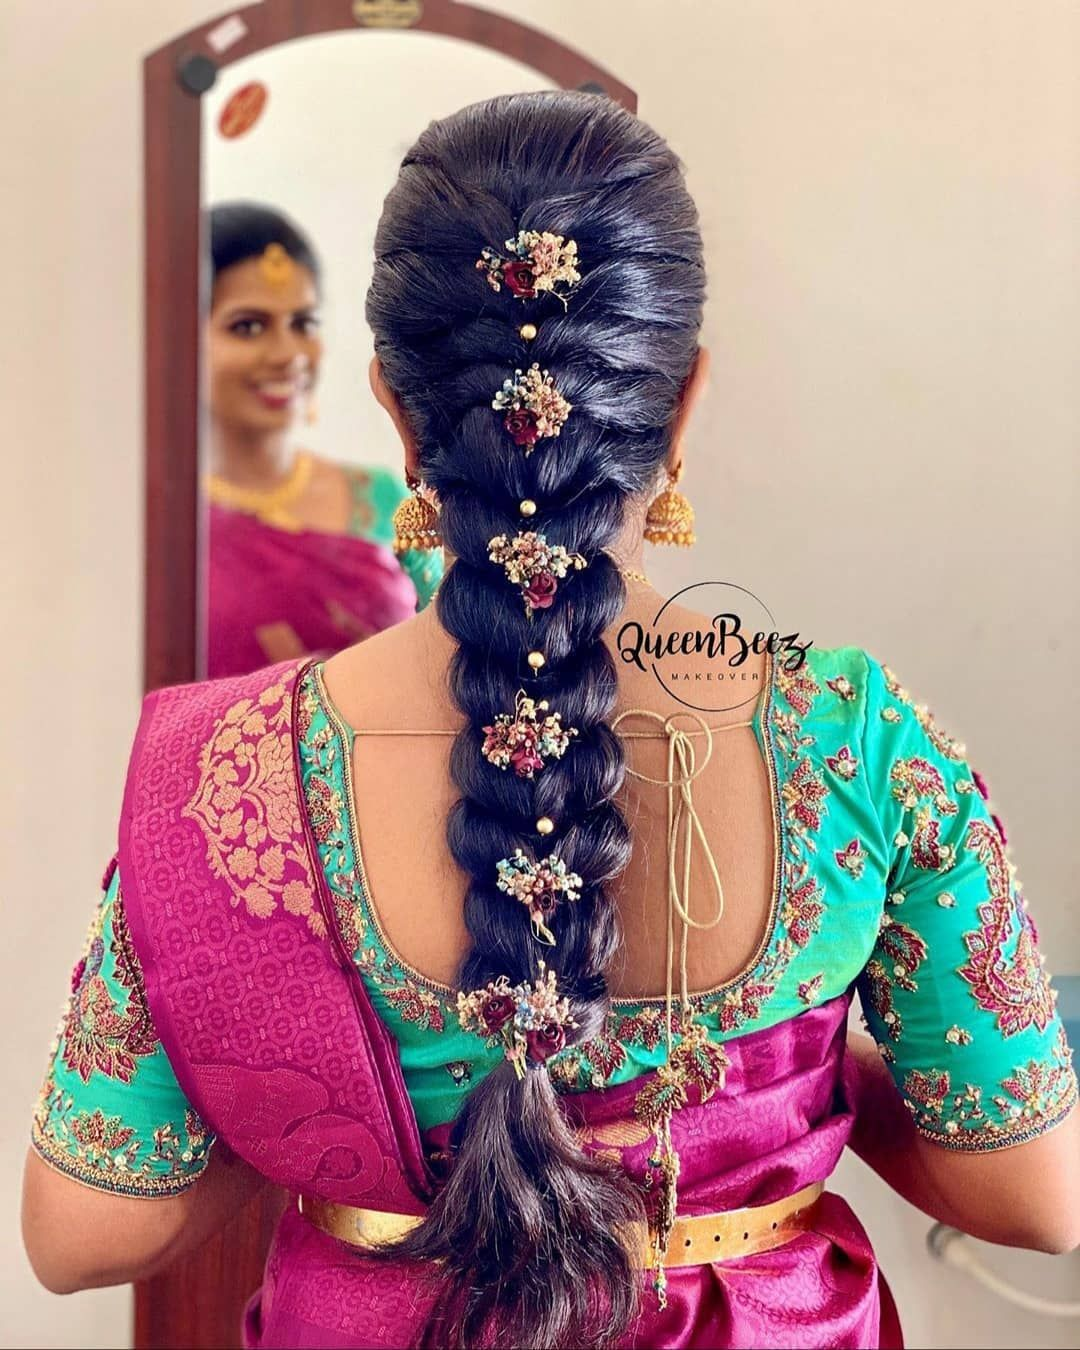 14 Likes 0 Comments Hairstylerukku Hairstylerukku On Instagram Her Choice Of Hairstyle I Hair Styles Indian Bride Hairstyle Indian Hairstyles For Saree